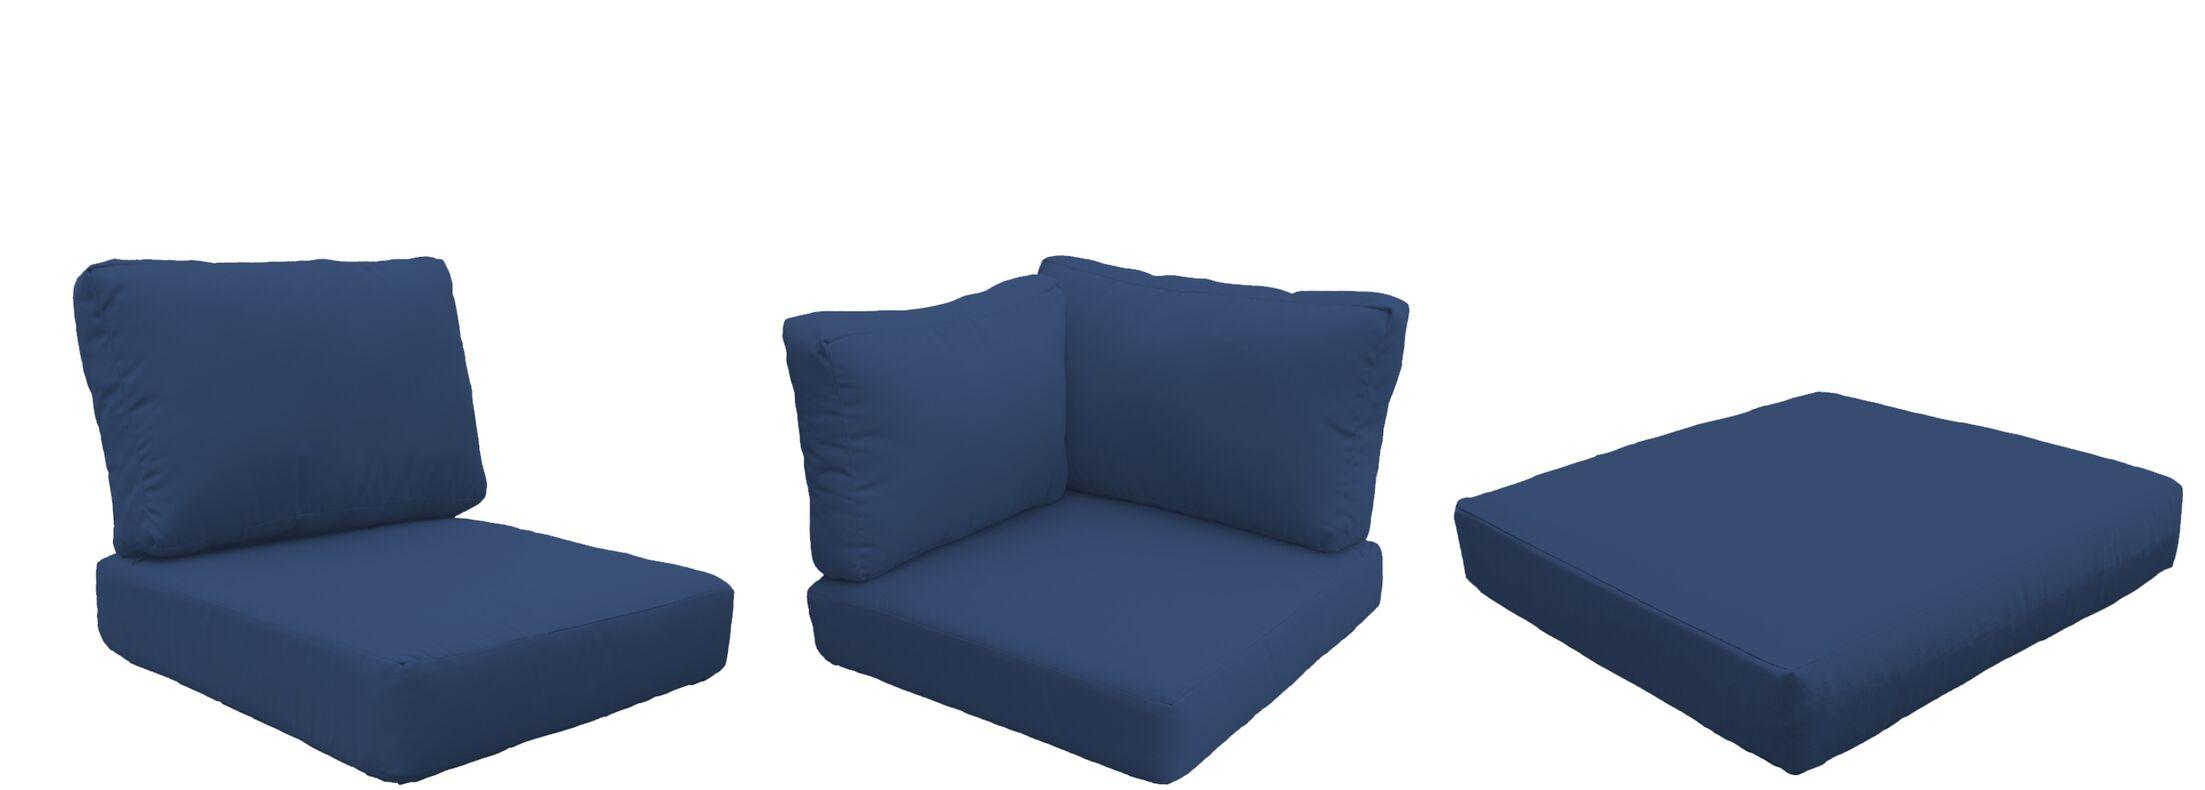 Eldredge Outdoor 18 Piece Lounge Chair Cushion Set Fabric: Navy